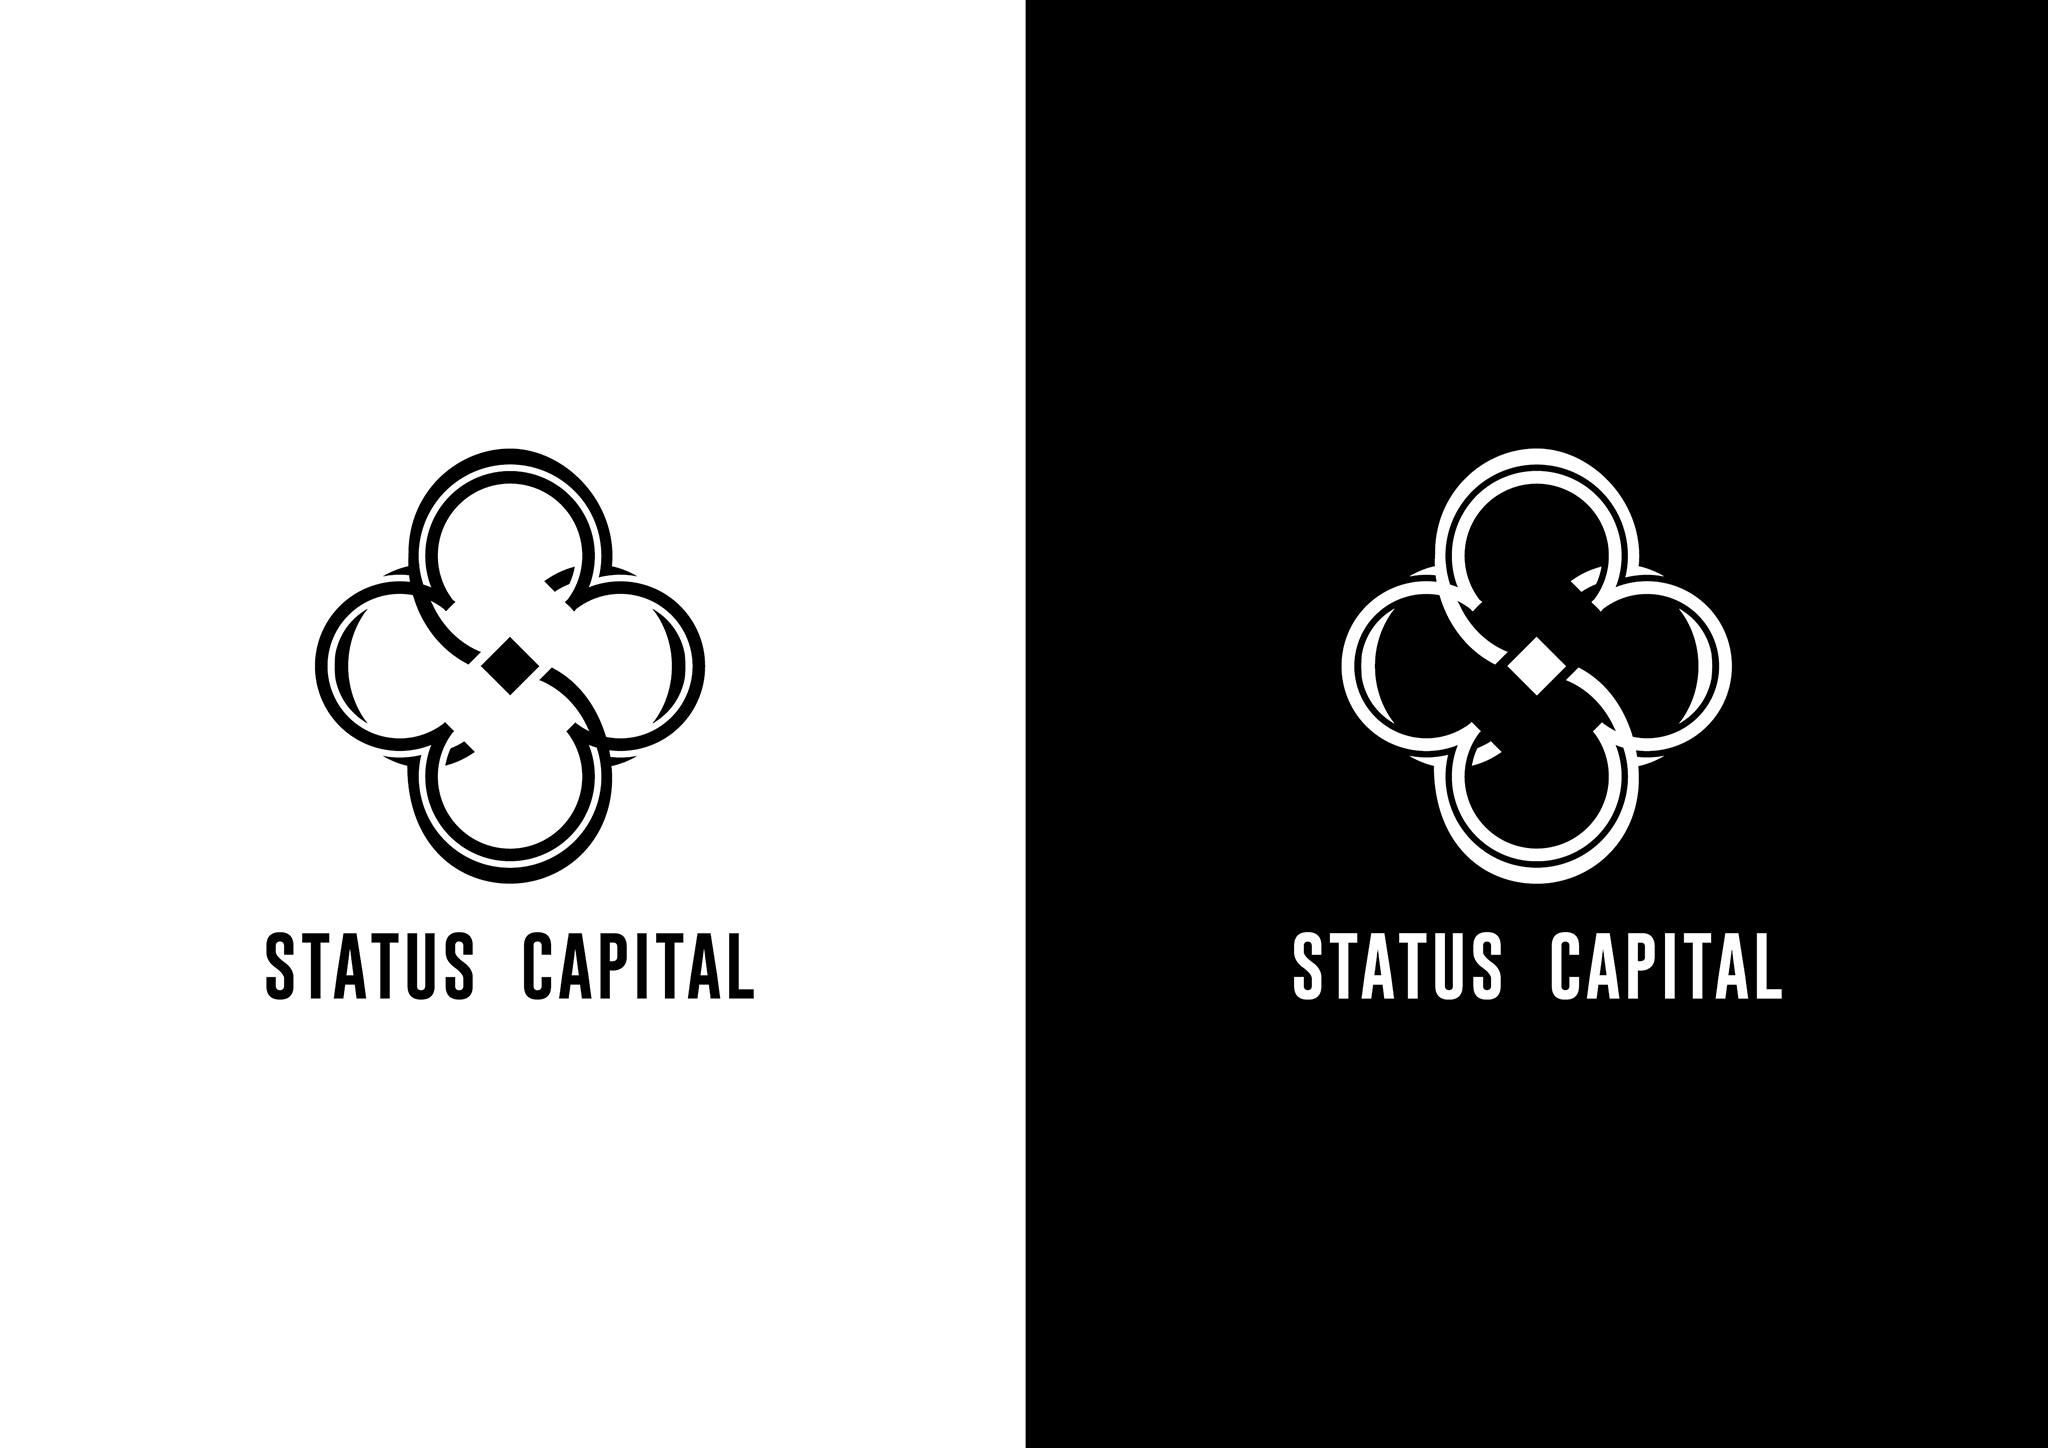 Status_capital_logo-02